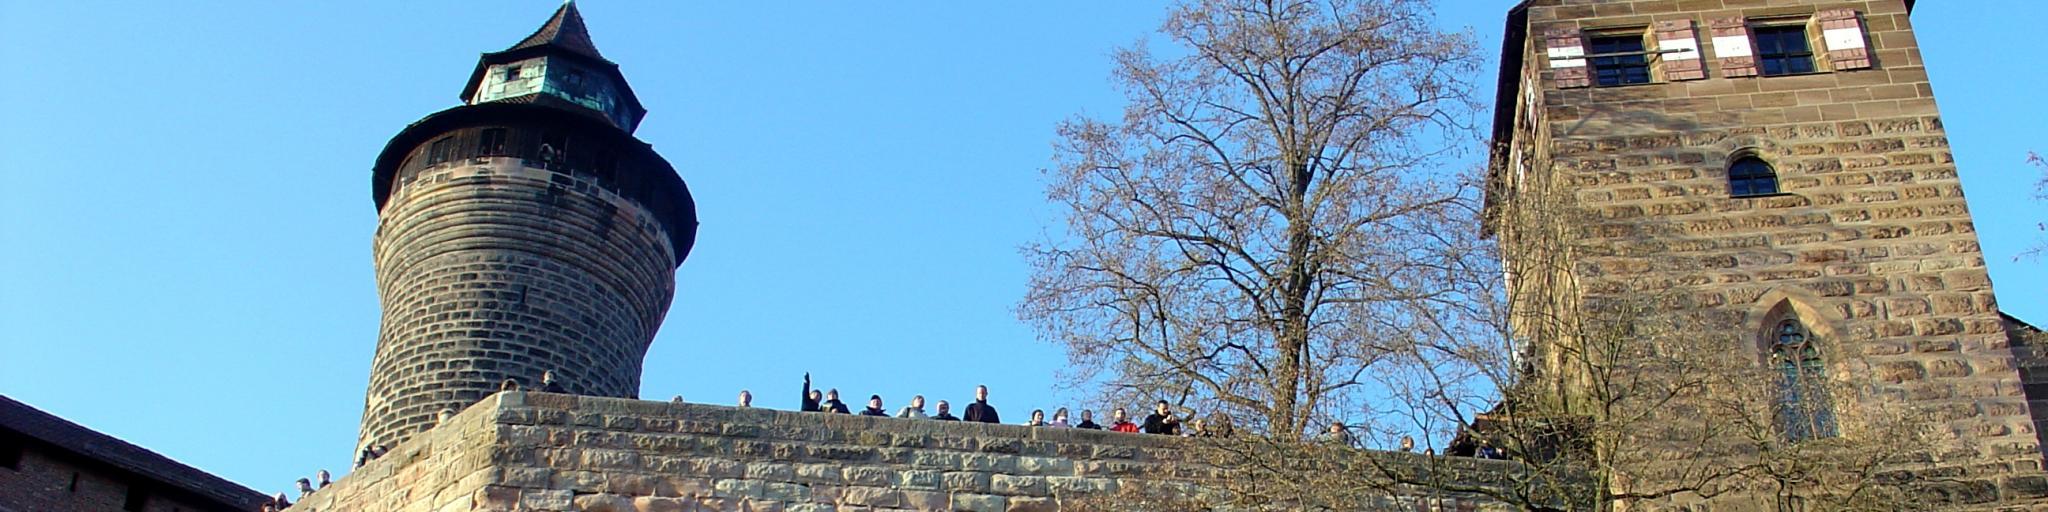 Low-level shot of Nuremberg Castle, Germany